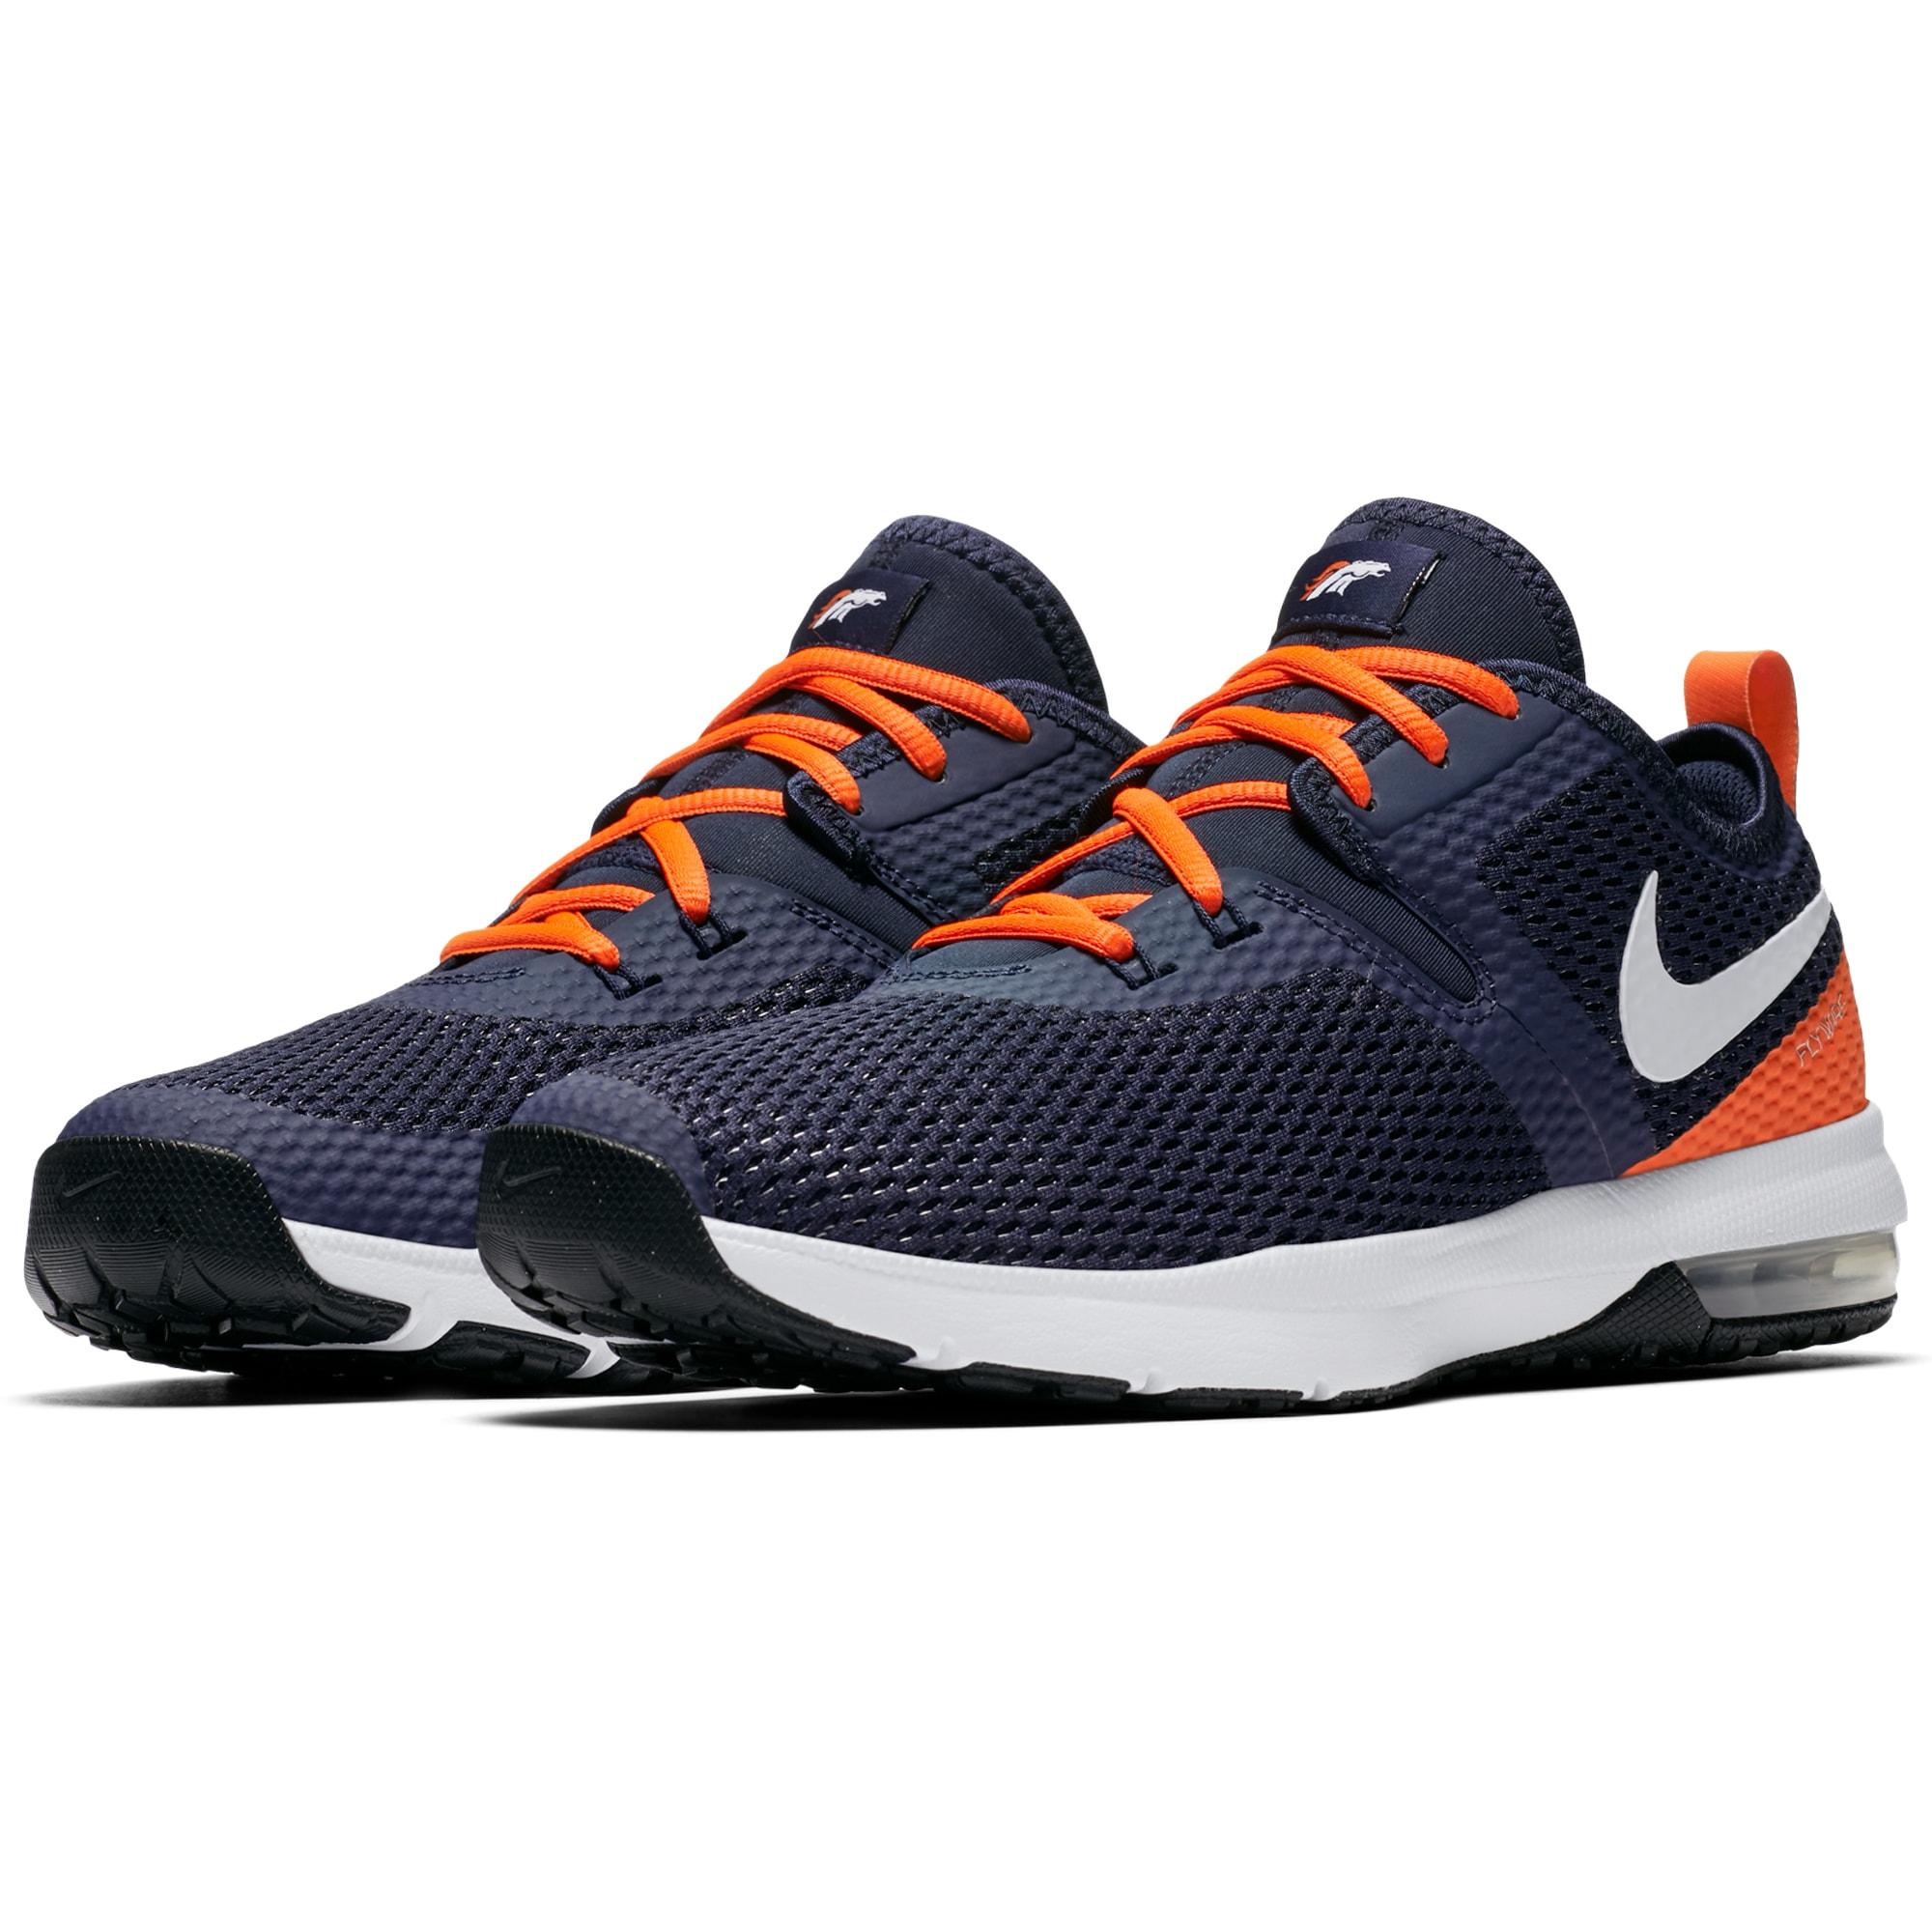 Denver Broncos Nike Air Max Typha 2 Shoes - Navy/Orange